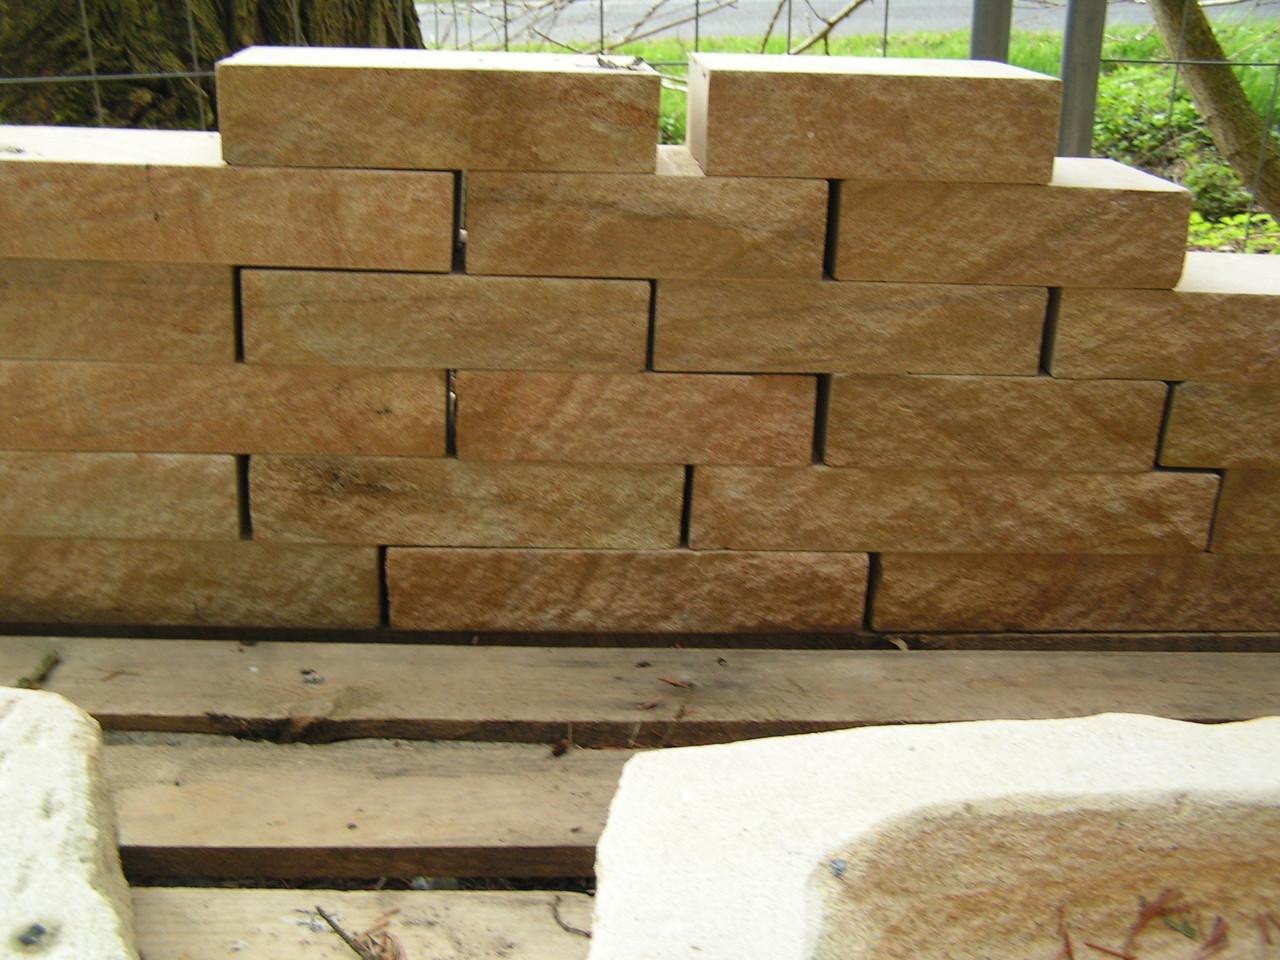 sandsteinsonderformen sandsteinklinker pflastersteine sandsteinbank hausnummer skulpturen. Black Bedroom Furniture Sets. Home Design Ideas